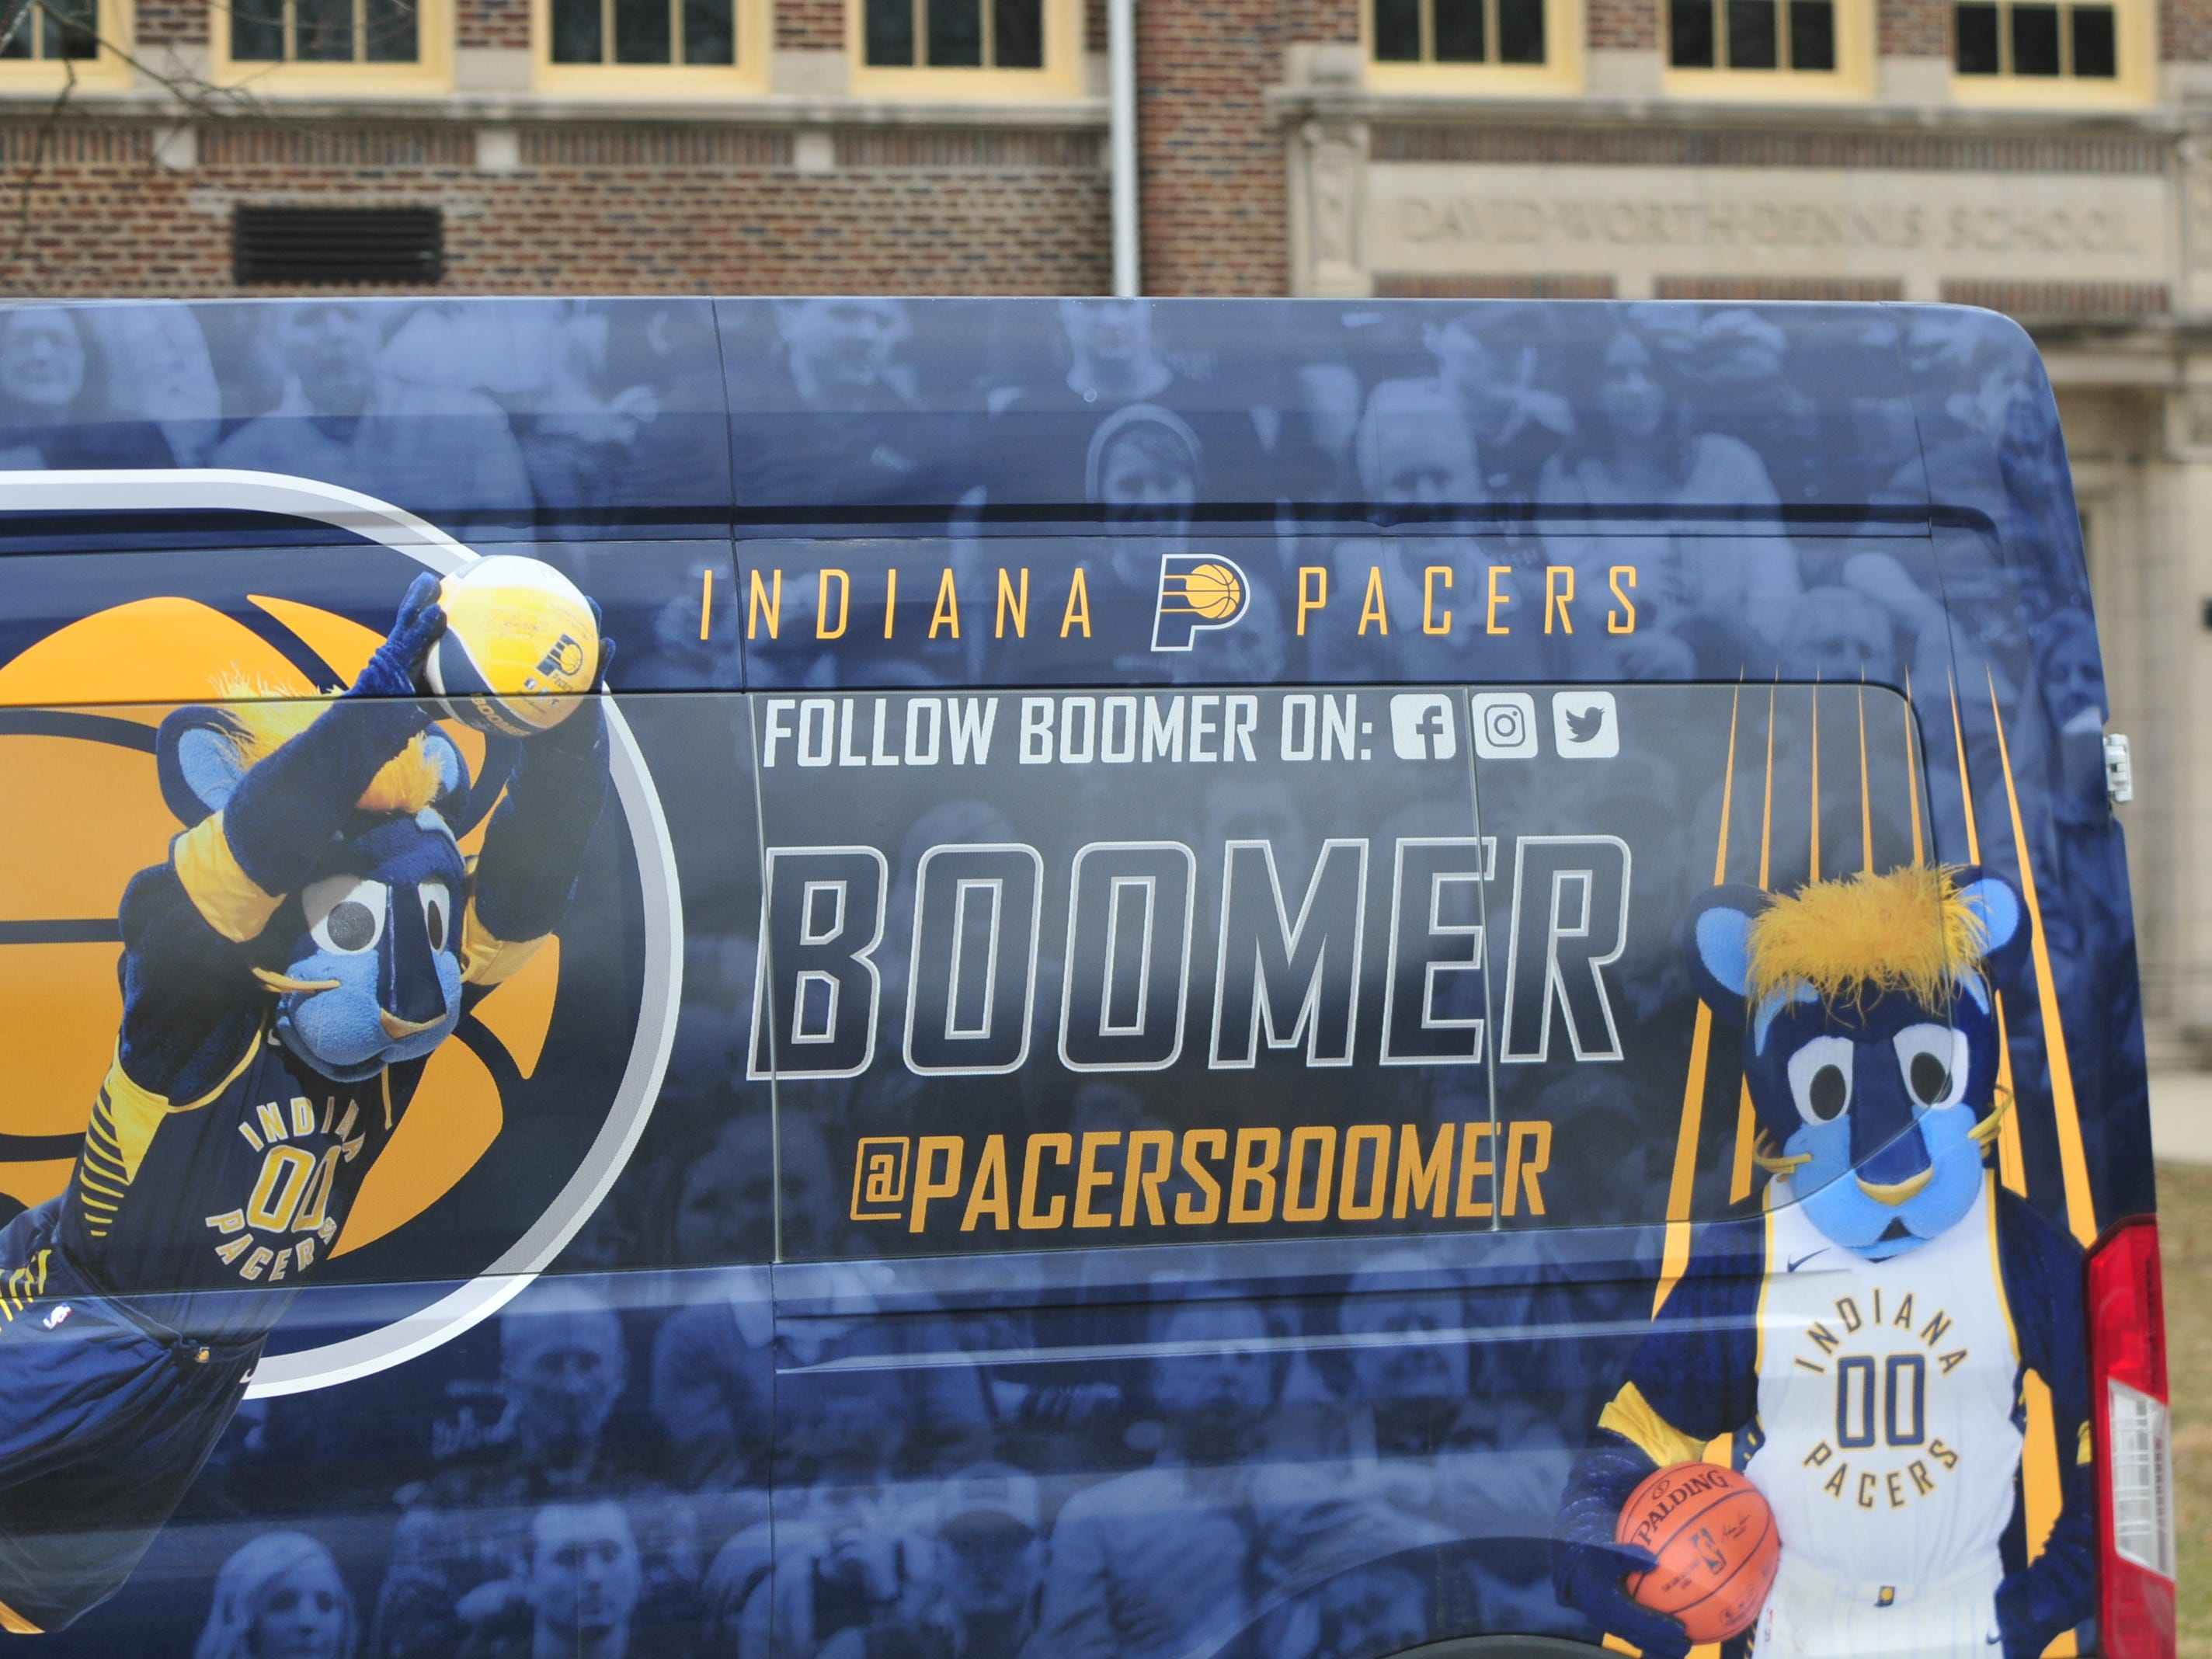 Boomer's van pulled up in front of Dennis Intermediate School on Wednesday.